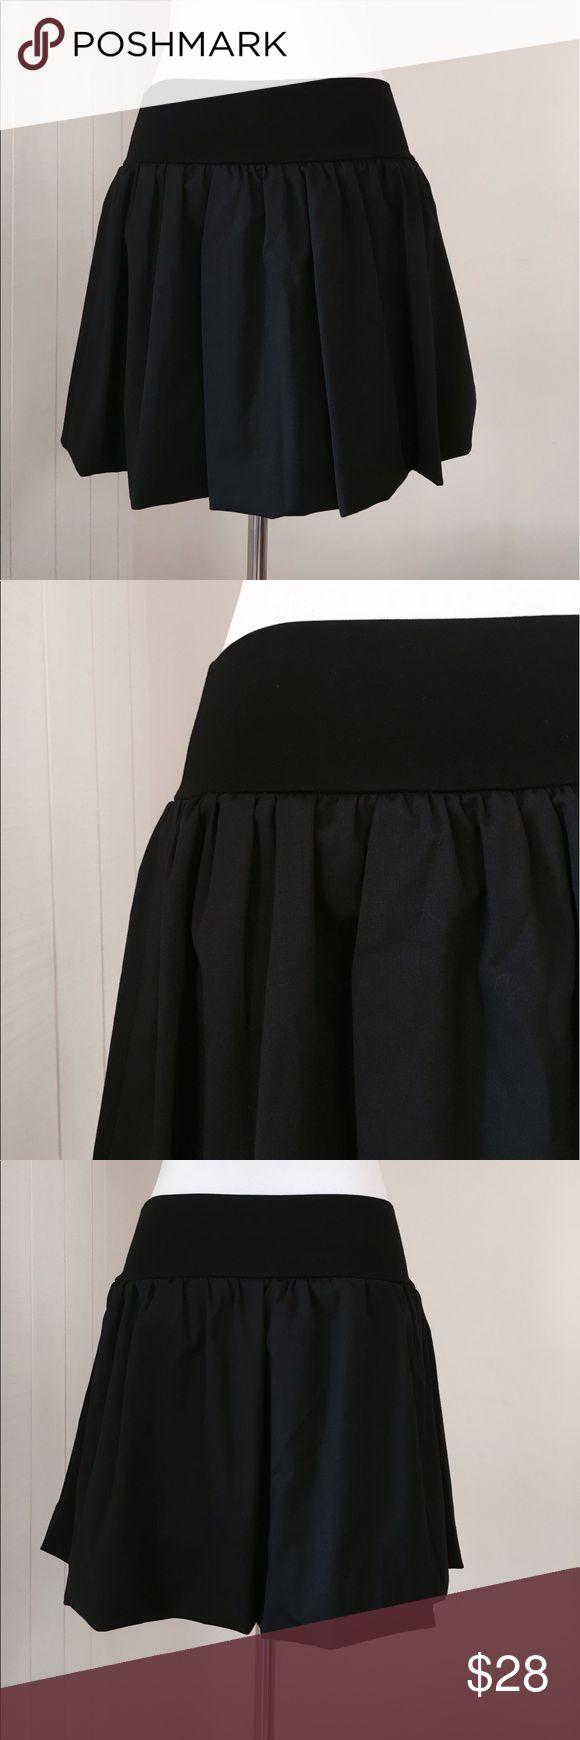 "Alice + Olivia Black wool  Silk Bubble Mini Skirt Beautiful and elegant Alice + Oliva black bubble skirt * Elasticated Waist * 98% Virgin Wool / 2% Lycra Exterior * 95% Silk / 5% Lycra Lining * 13"" Waist (can expand) * 15"" Length Alice + Olivia Skirts Mini"